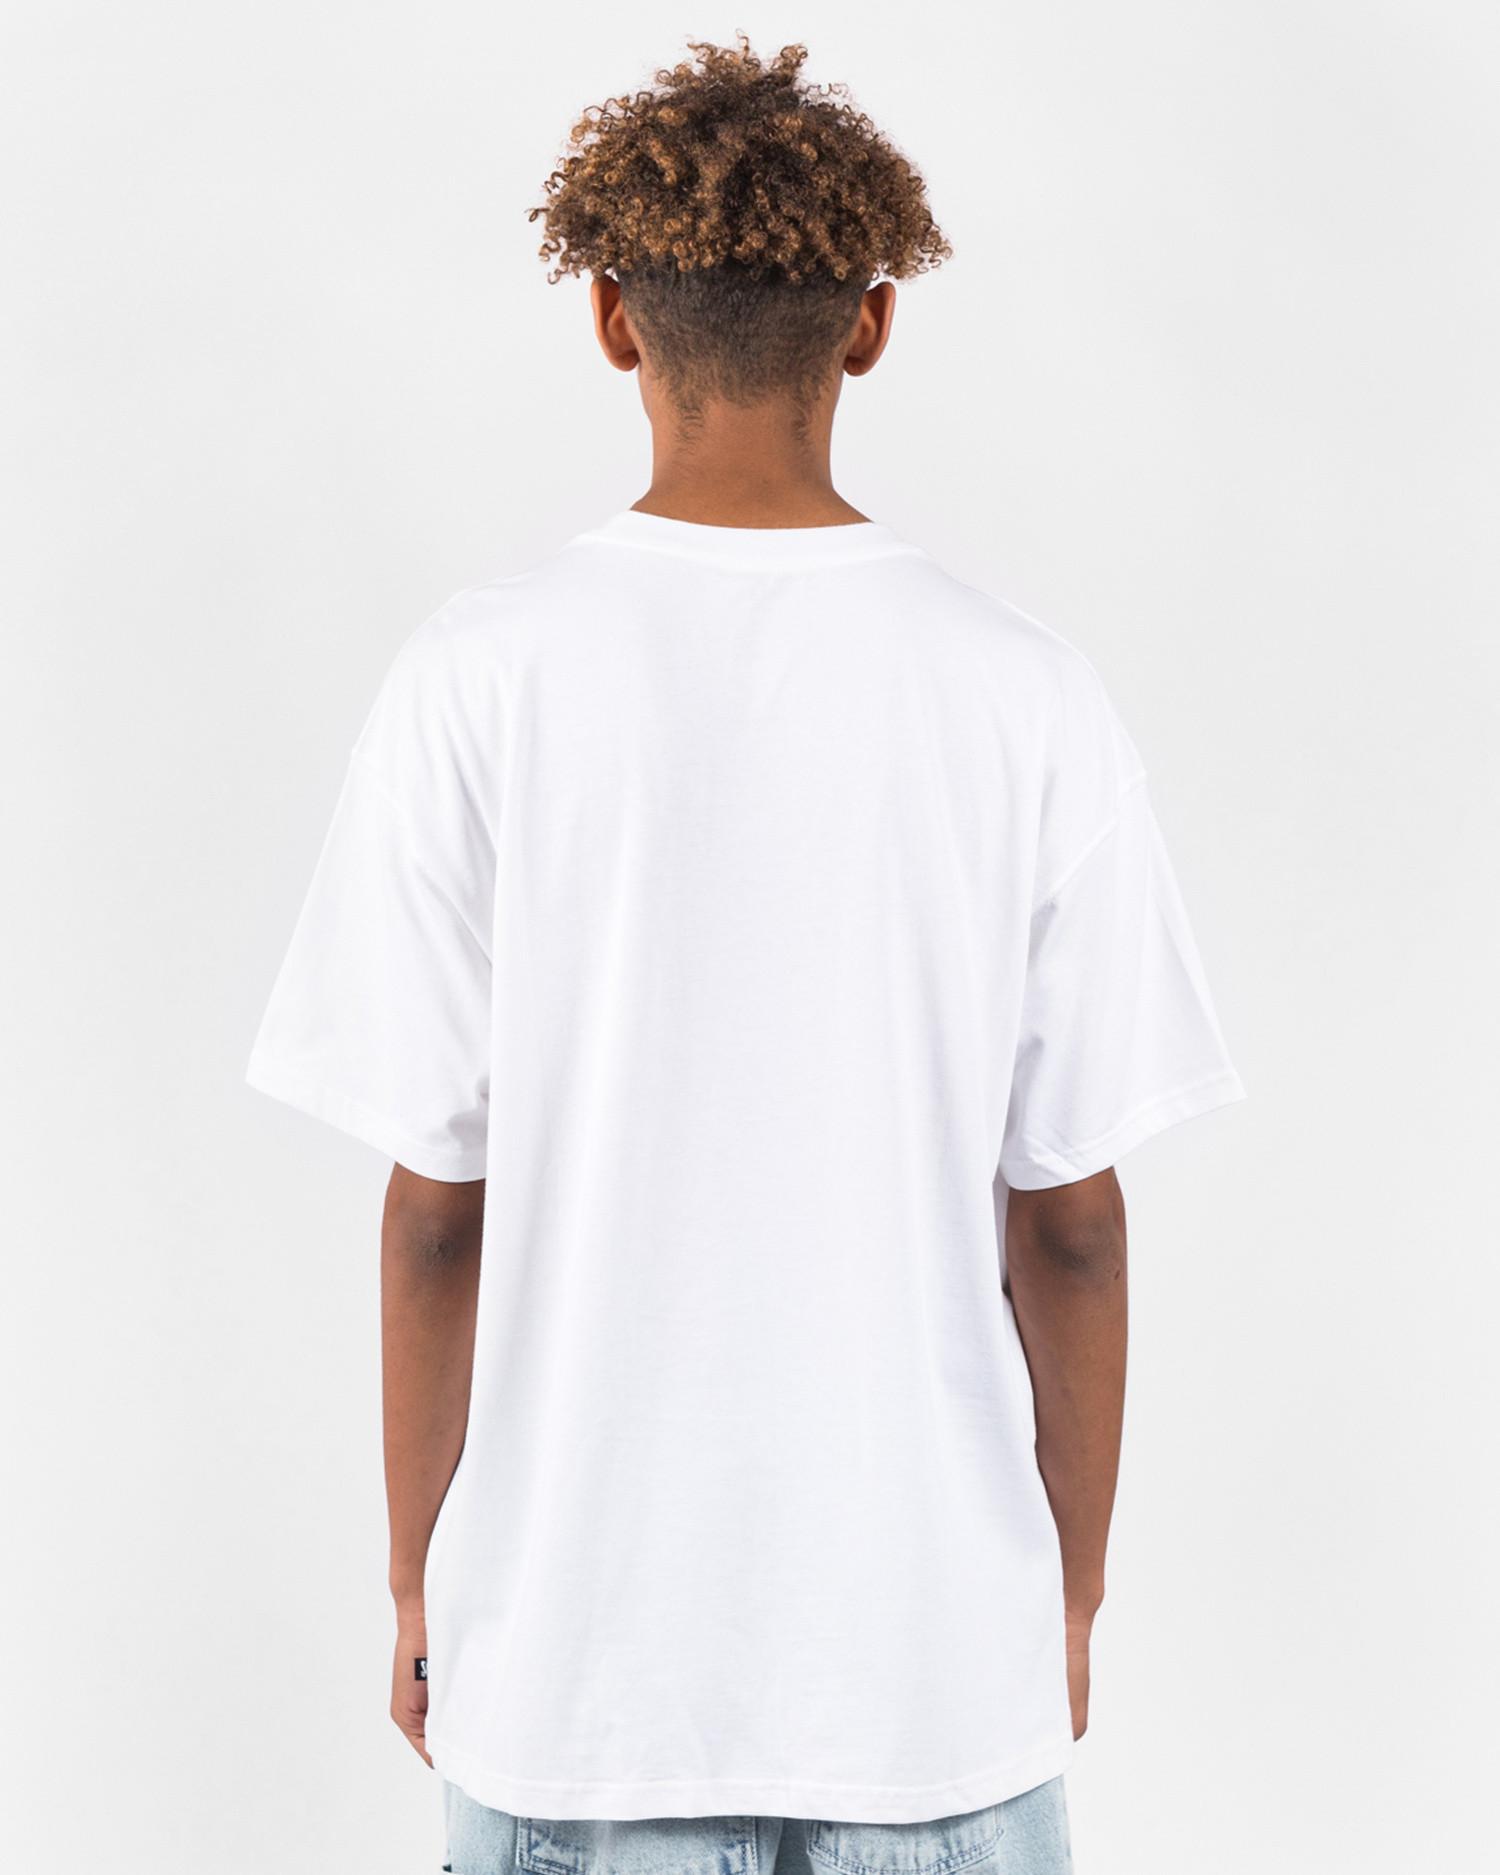 Nike SB T-shirt White/Black